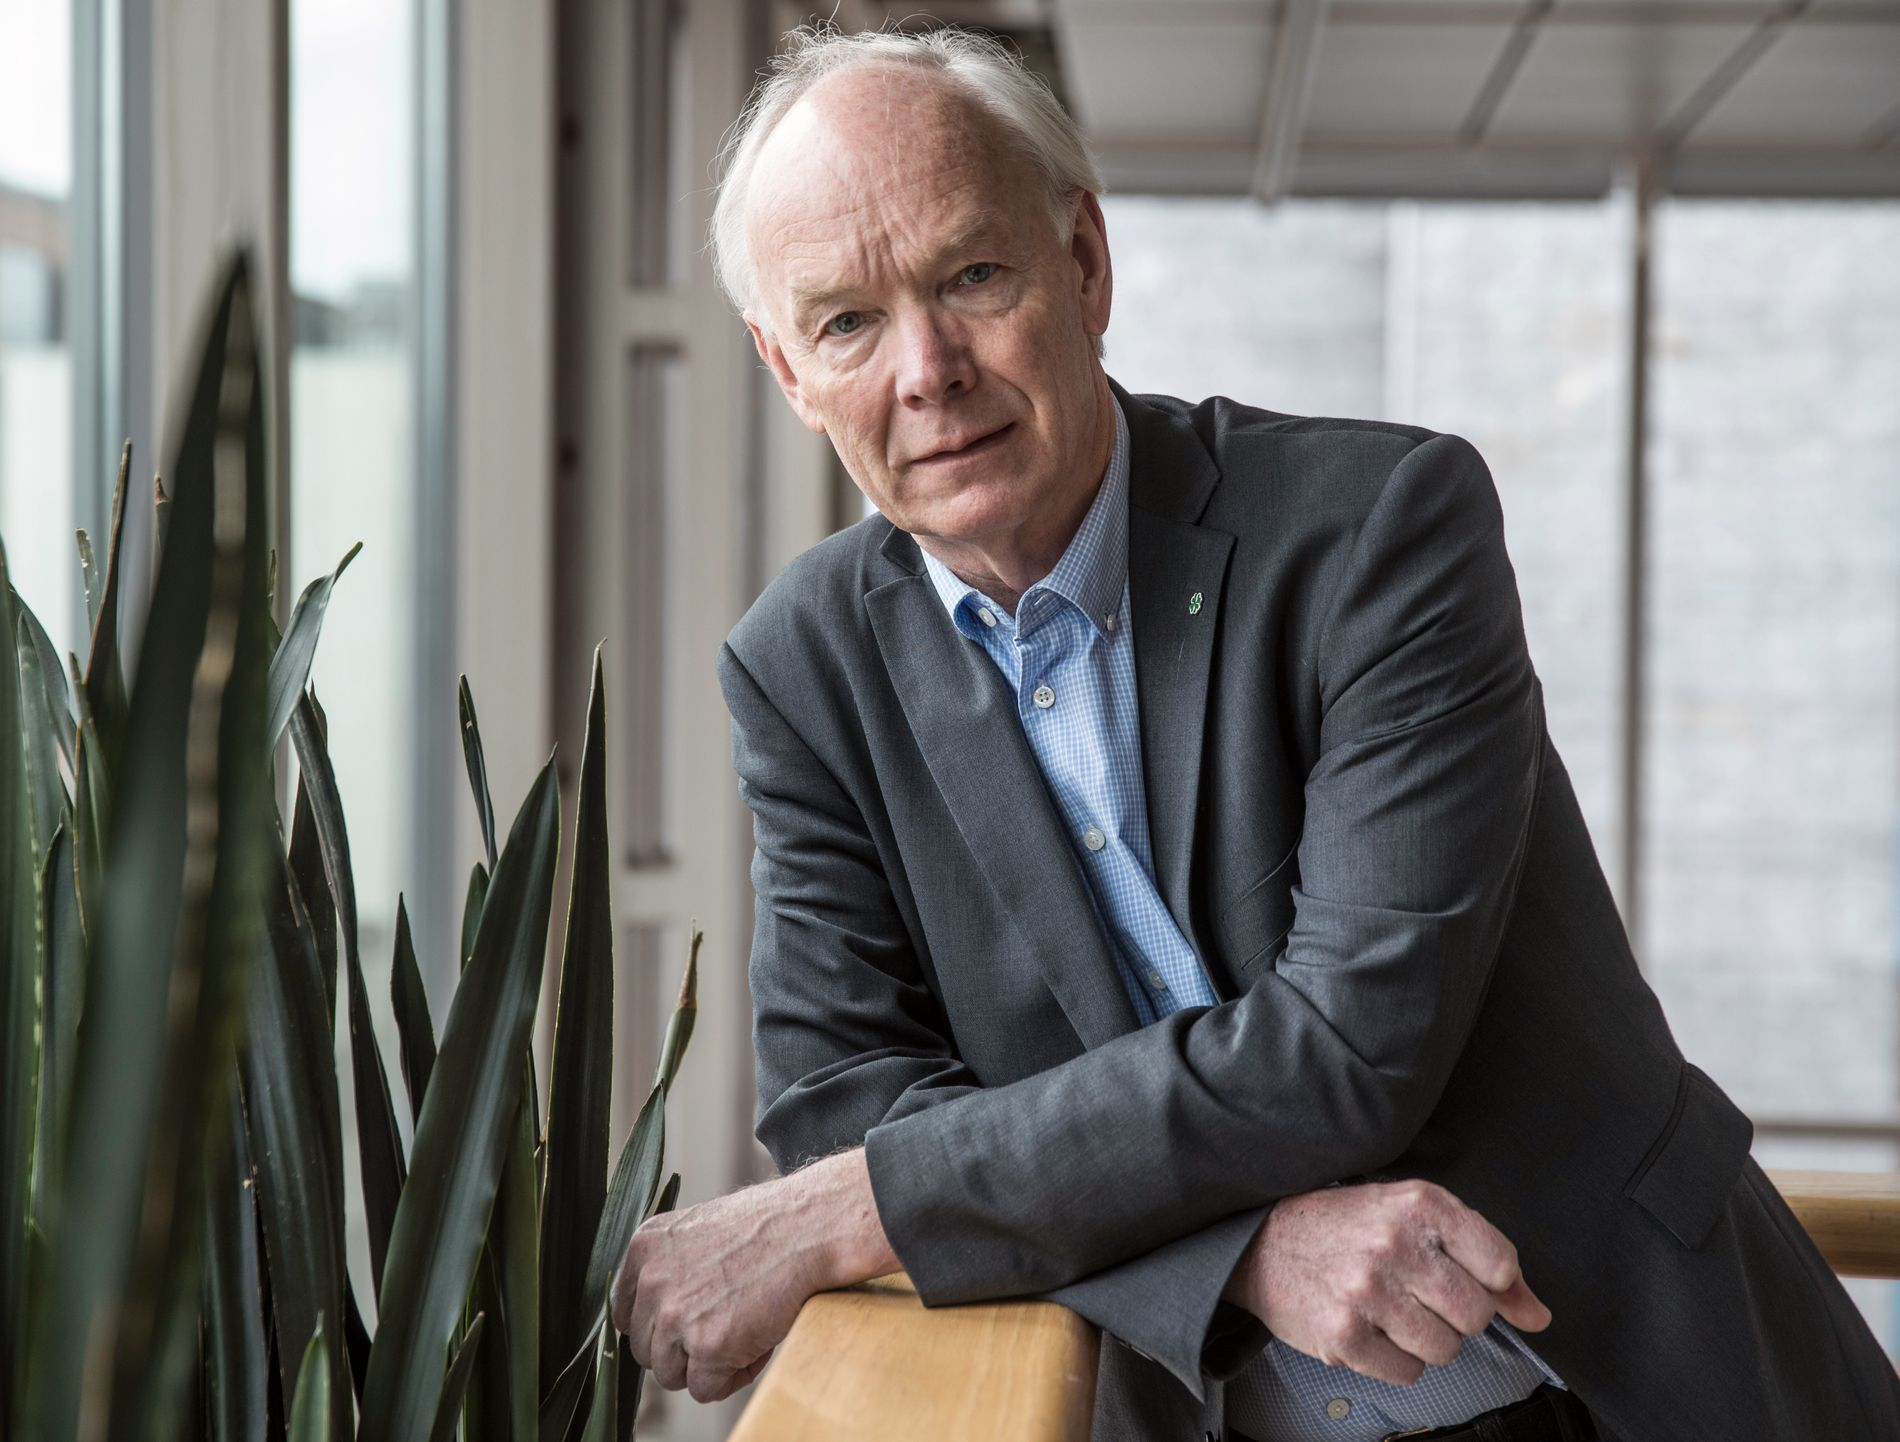 REAGERER: Stortingsrepresentant Per Olaf Lundteigen (Sp), her avbildet under et intervju med VG i fjor.